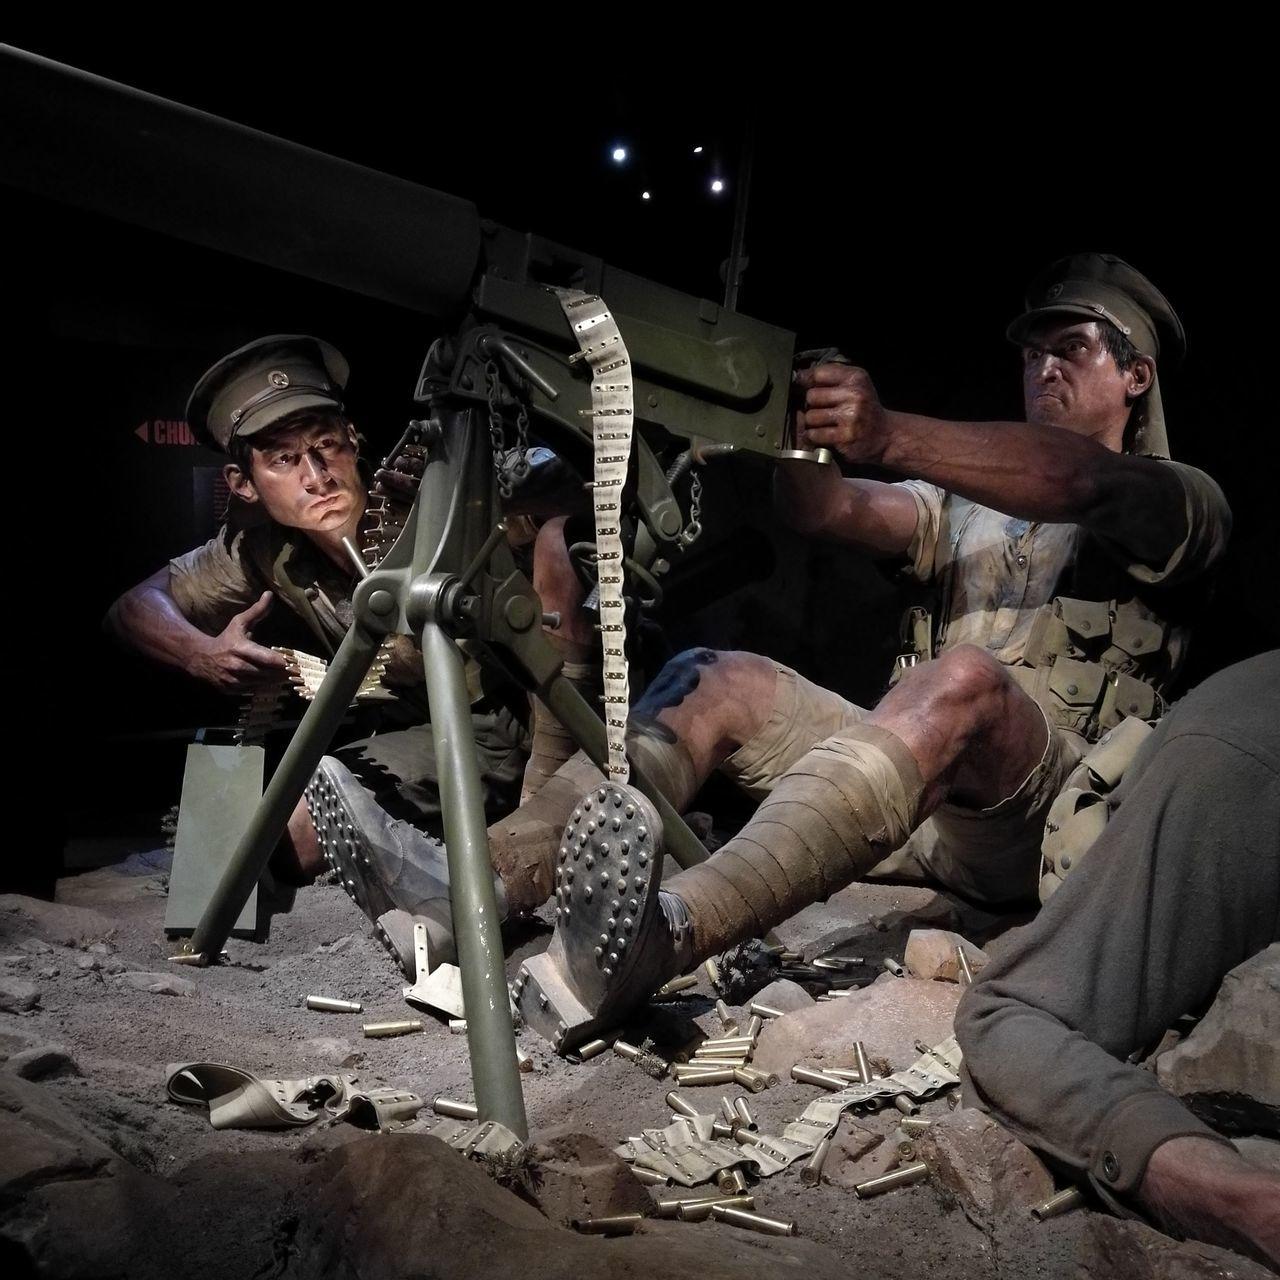 Only Men Night Teamwork Endurance Outdoors Gallipoli Ww1 Lifelike Sculpture War Machine Gun Soldier Museum Exhibition Wellington  New Zealand People Full Length